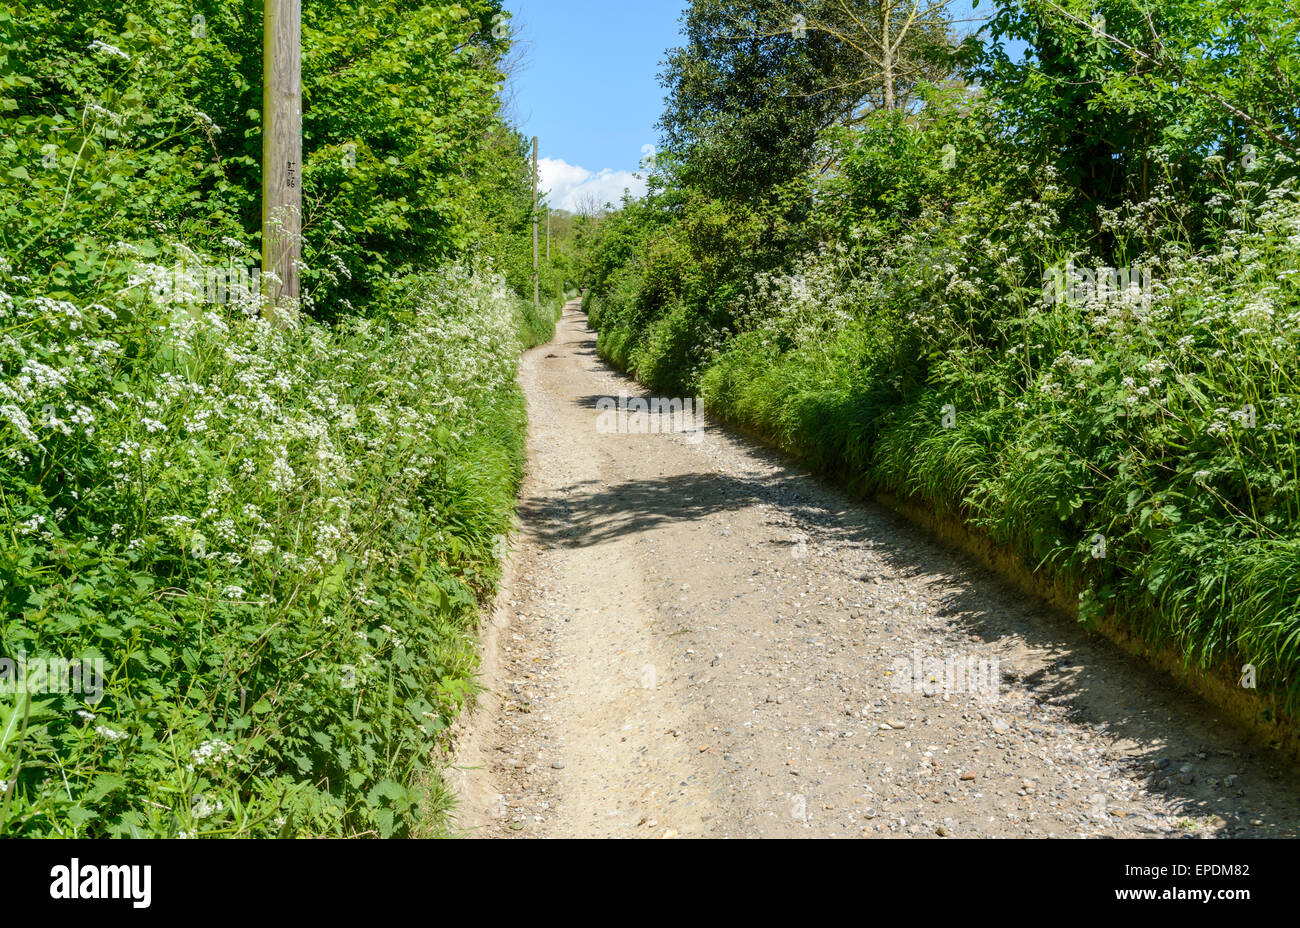 Narrow country lane in England, UK. - Stock Image